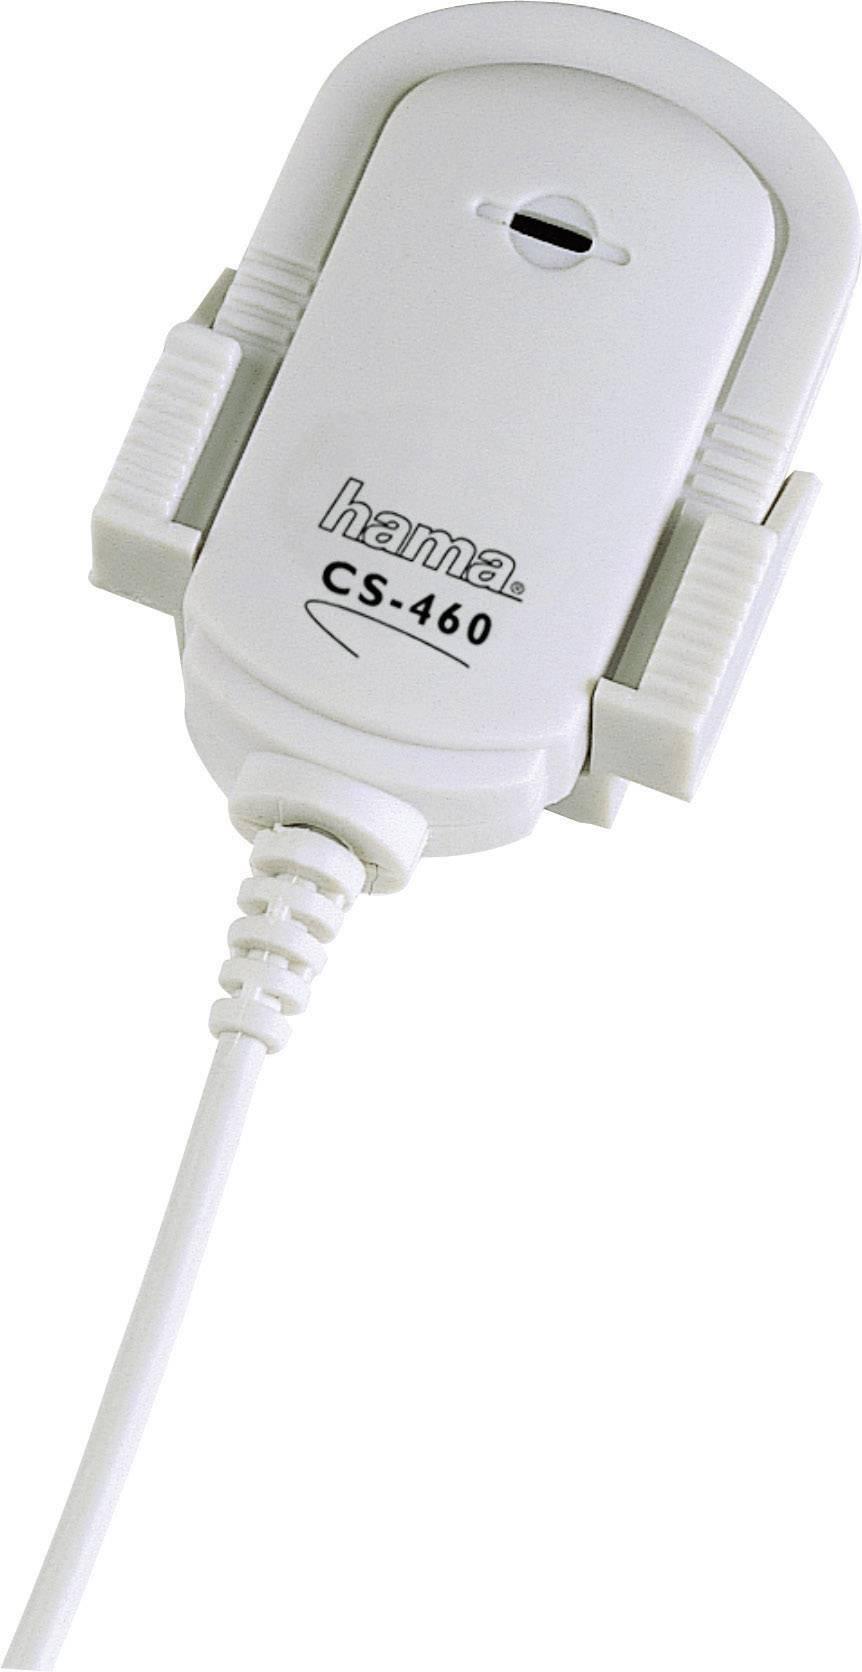 Mikrofon s klipem, Hama CS 460